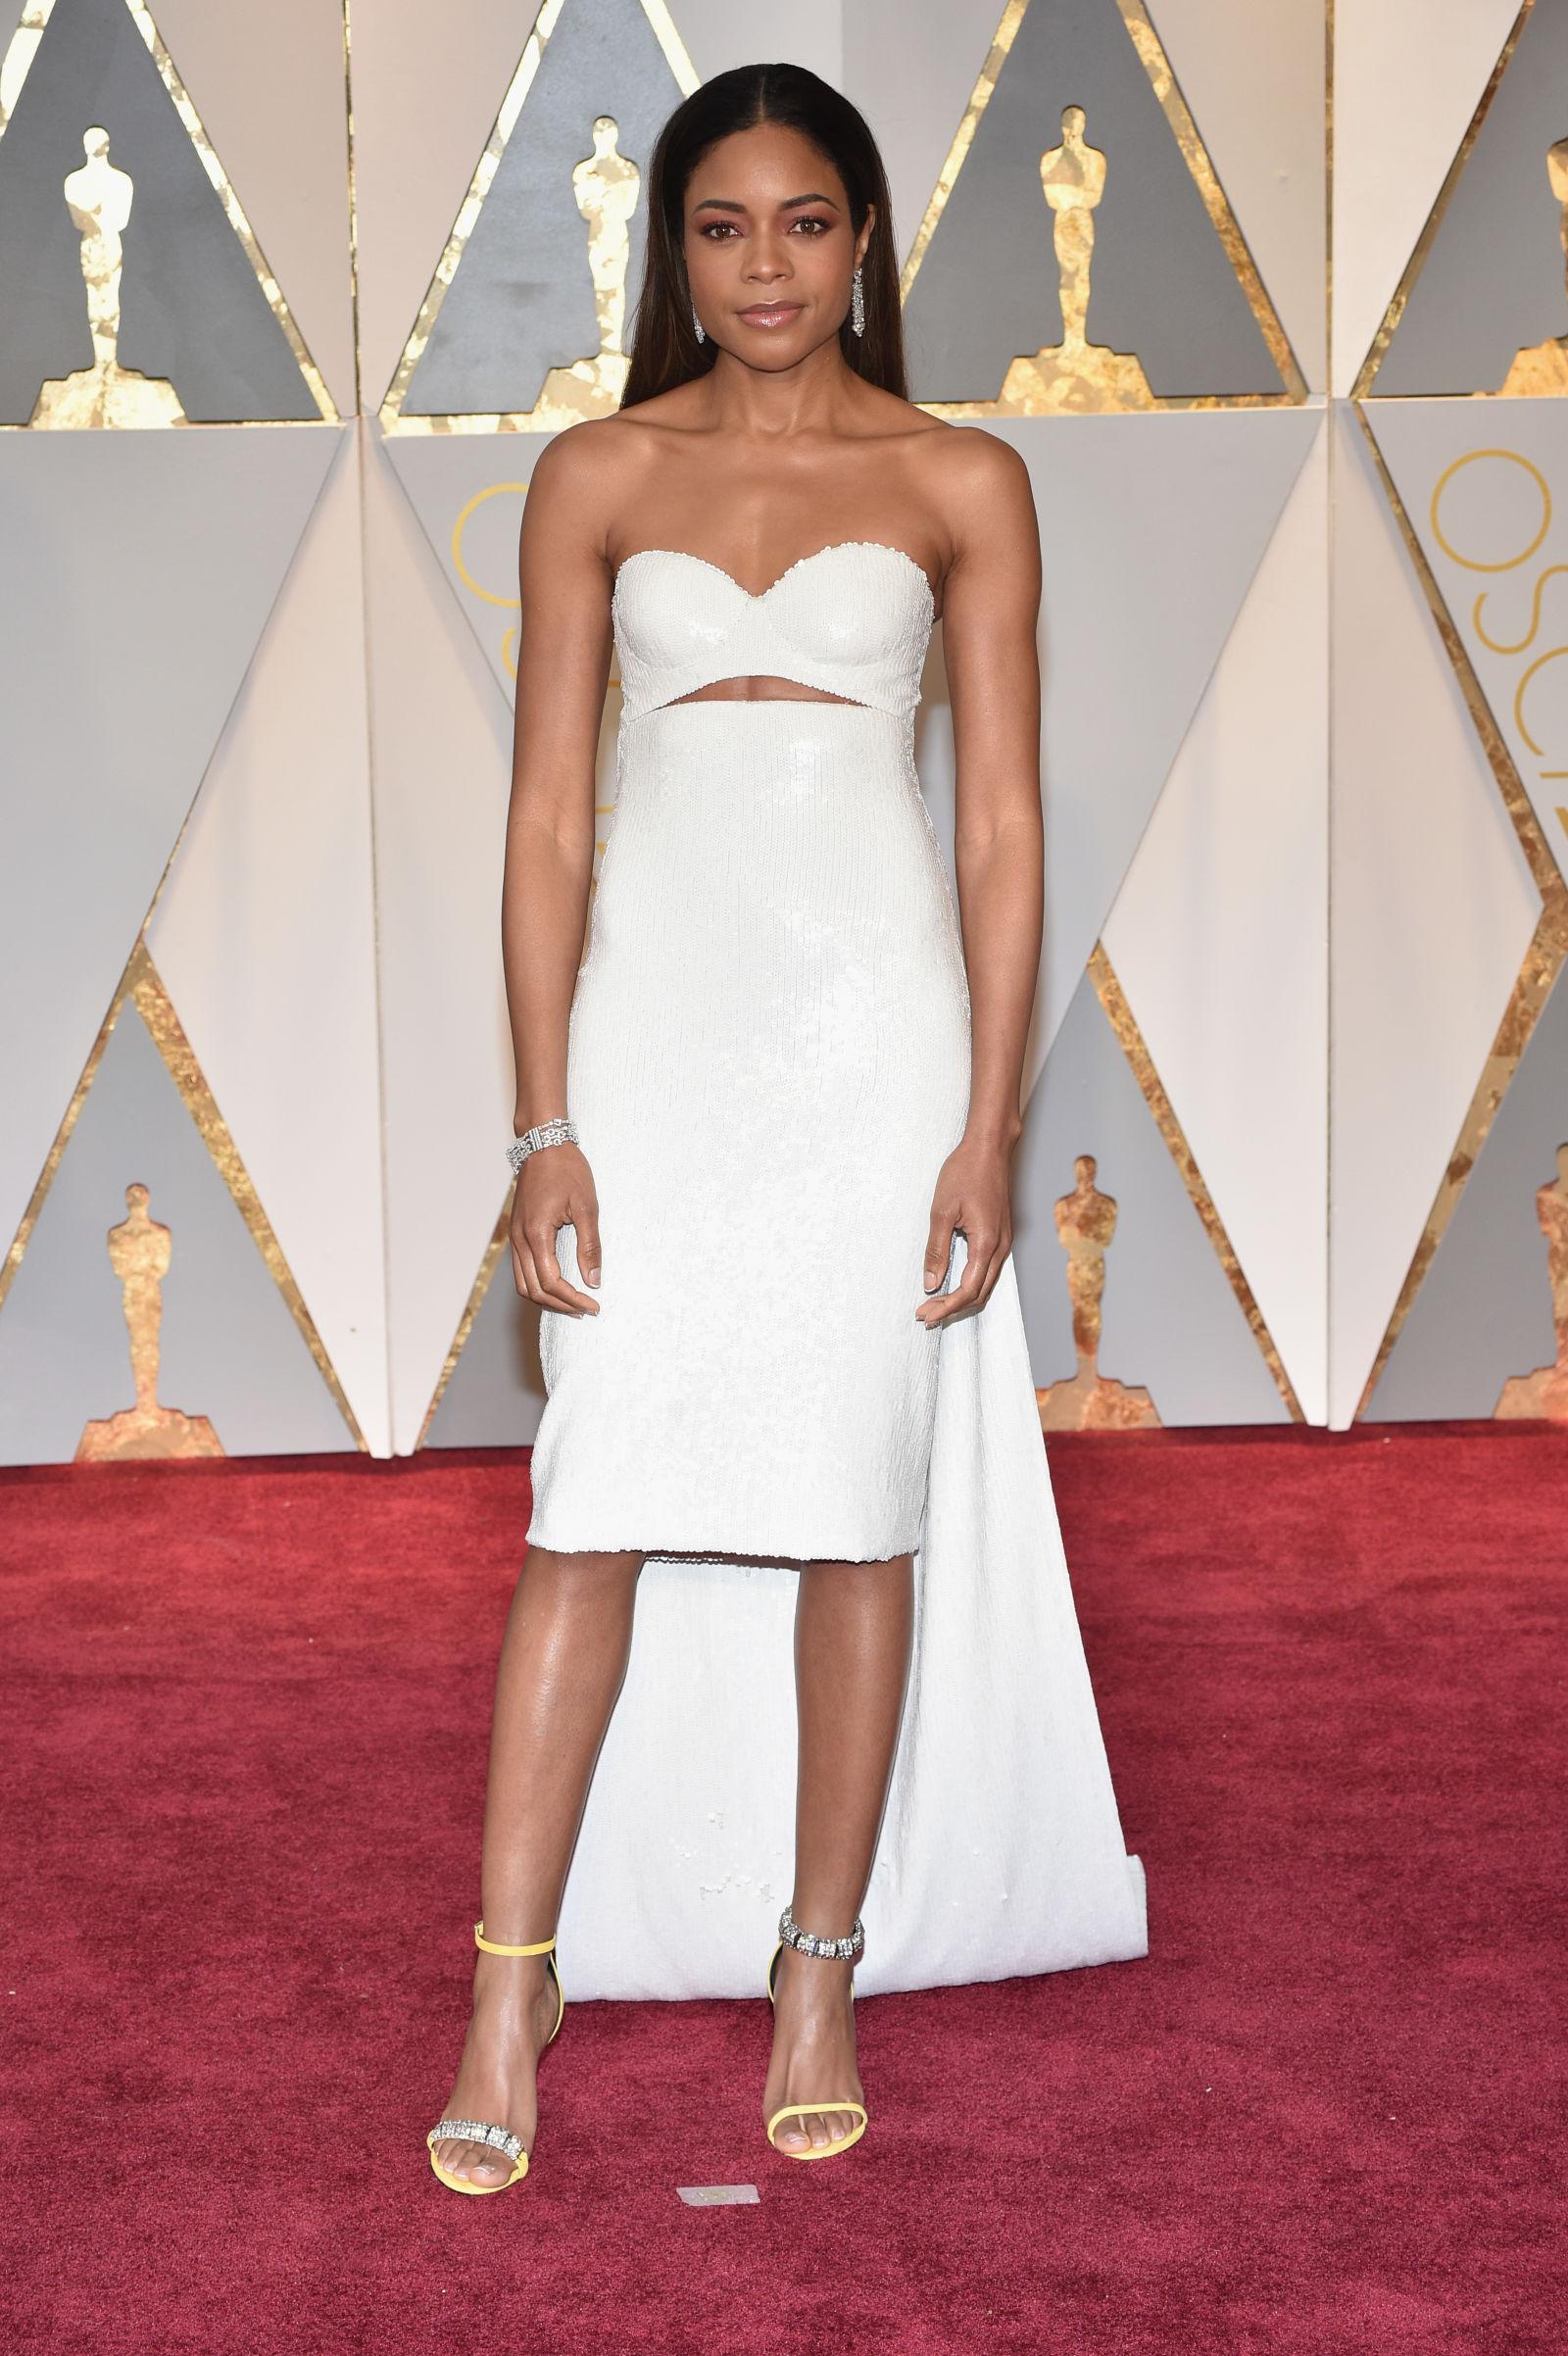 Red Carpet Best Dresses at Oscars 2017 Clavin Klein red carpet Red Carpet Best Dresses at Oscars 2017 Red Carpet Best Dresses at Oscars 2017 Clavin Klein